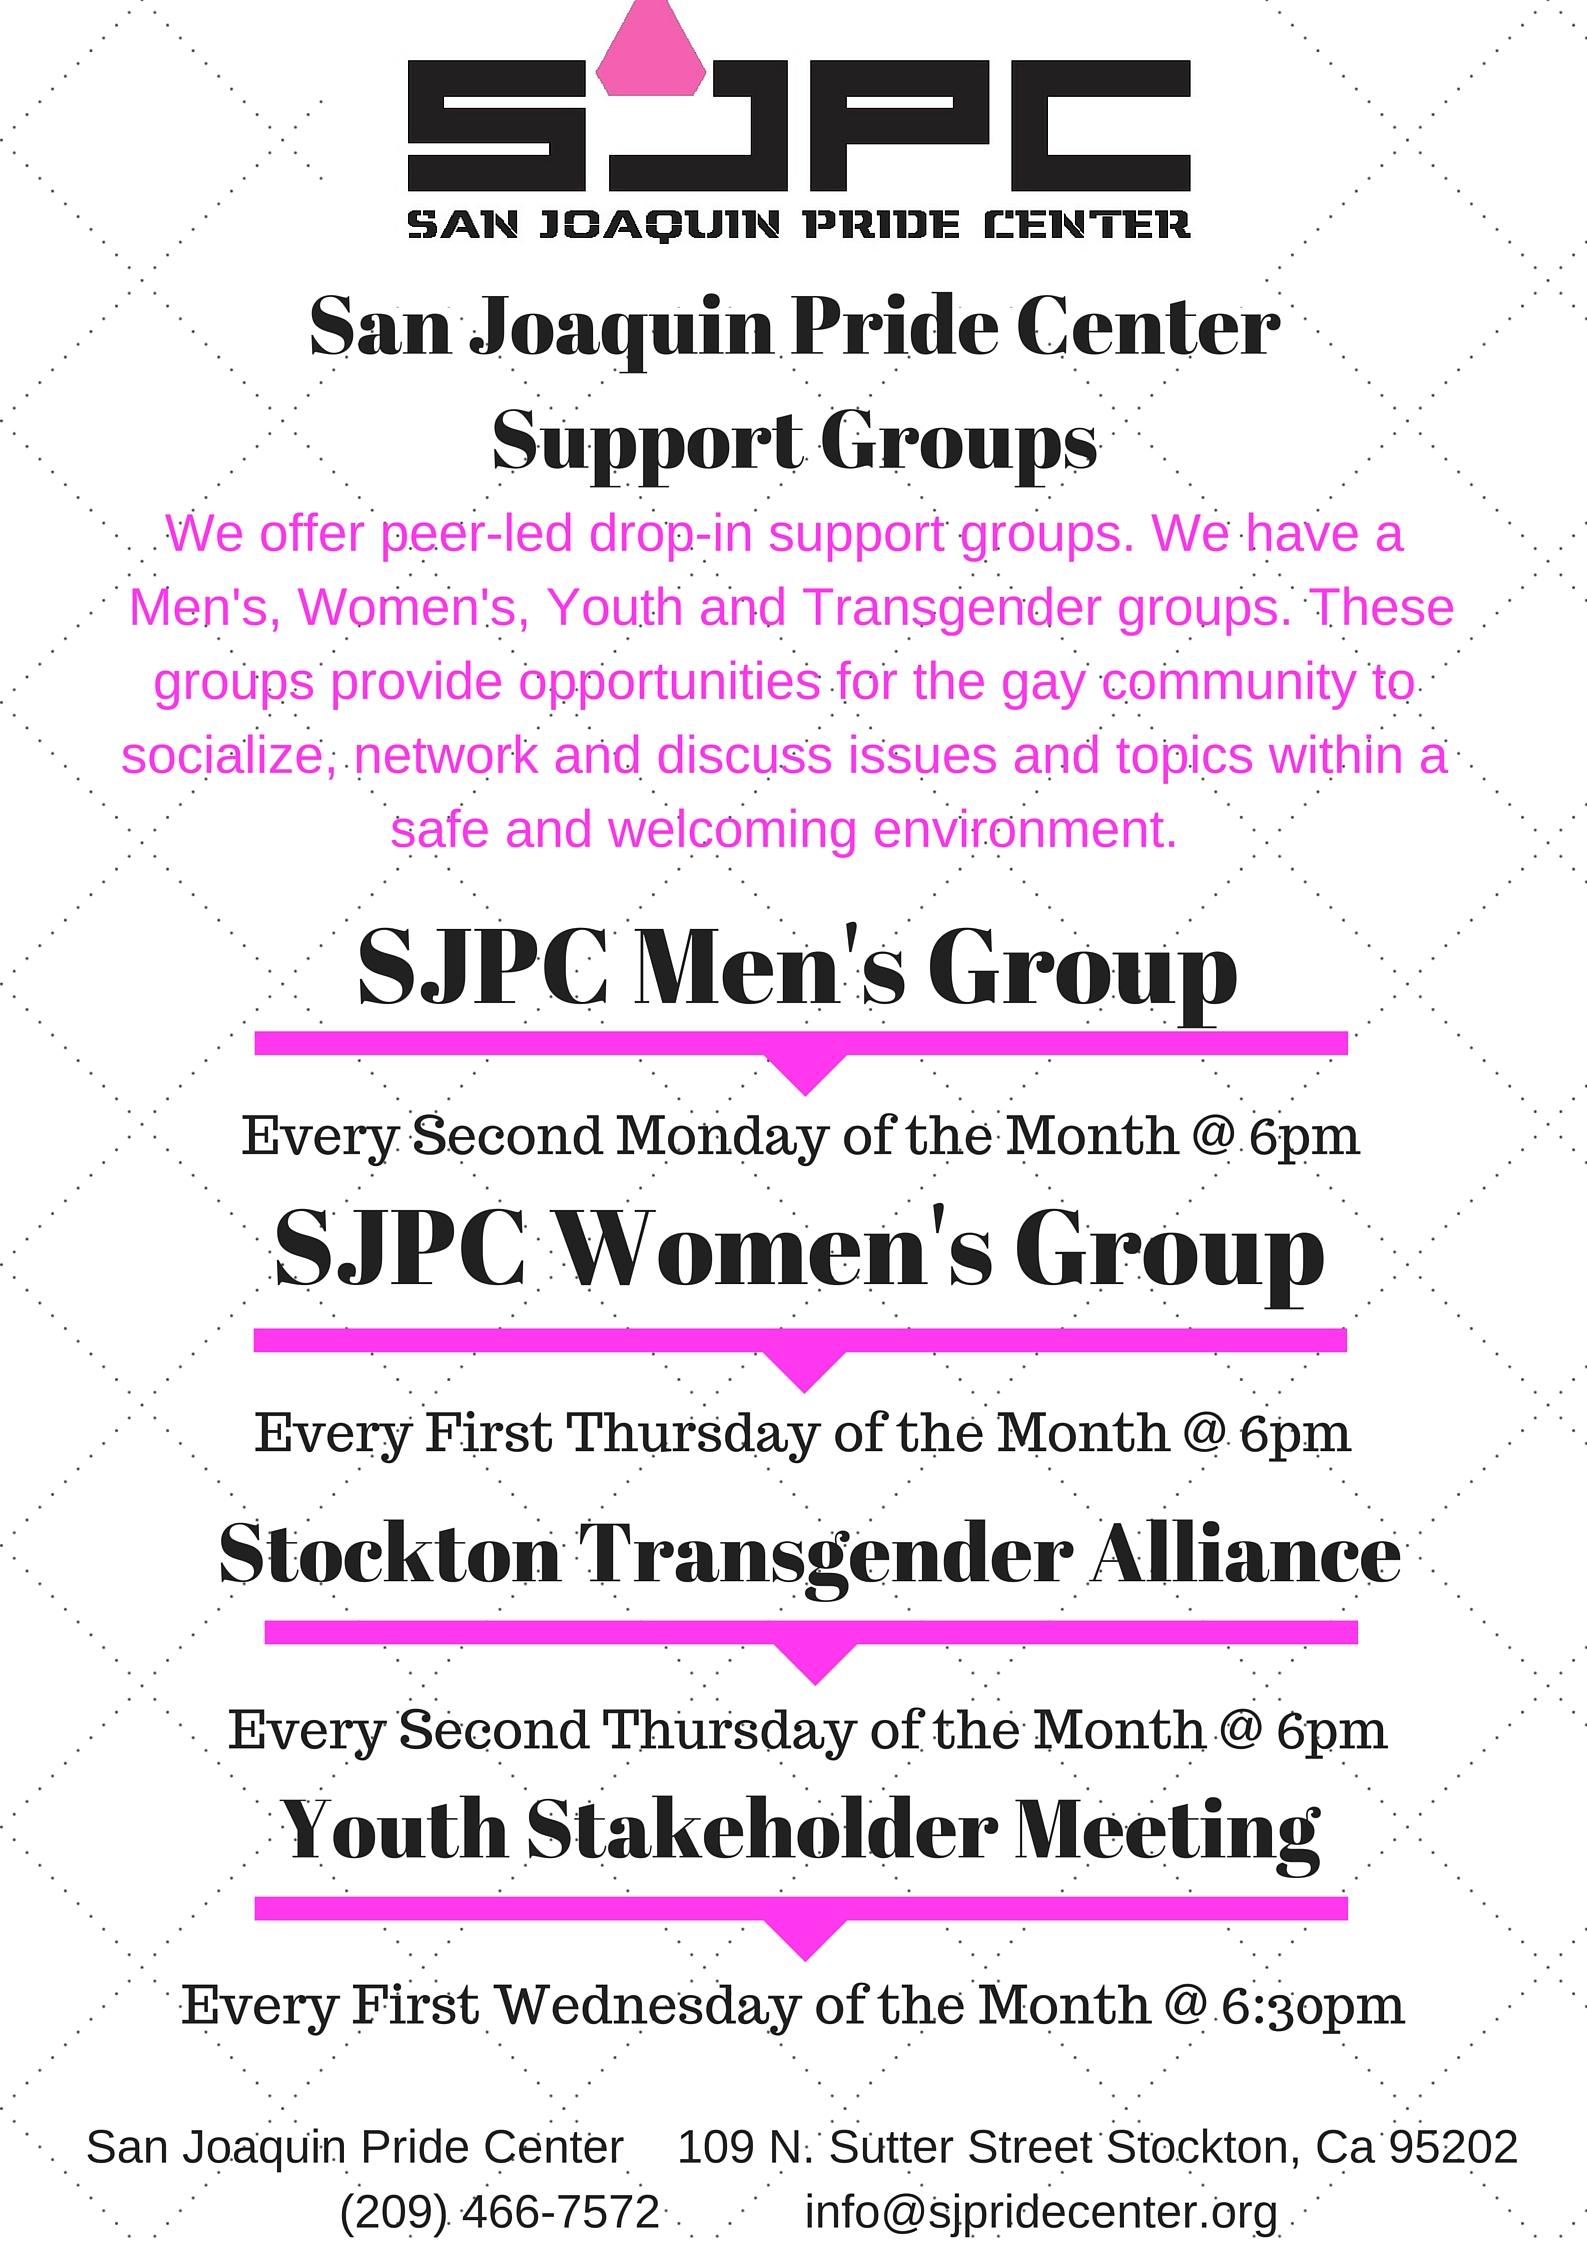 San_Joaquin_Pride_Center_Support_Groups.jpg